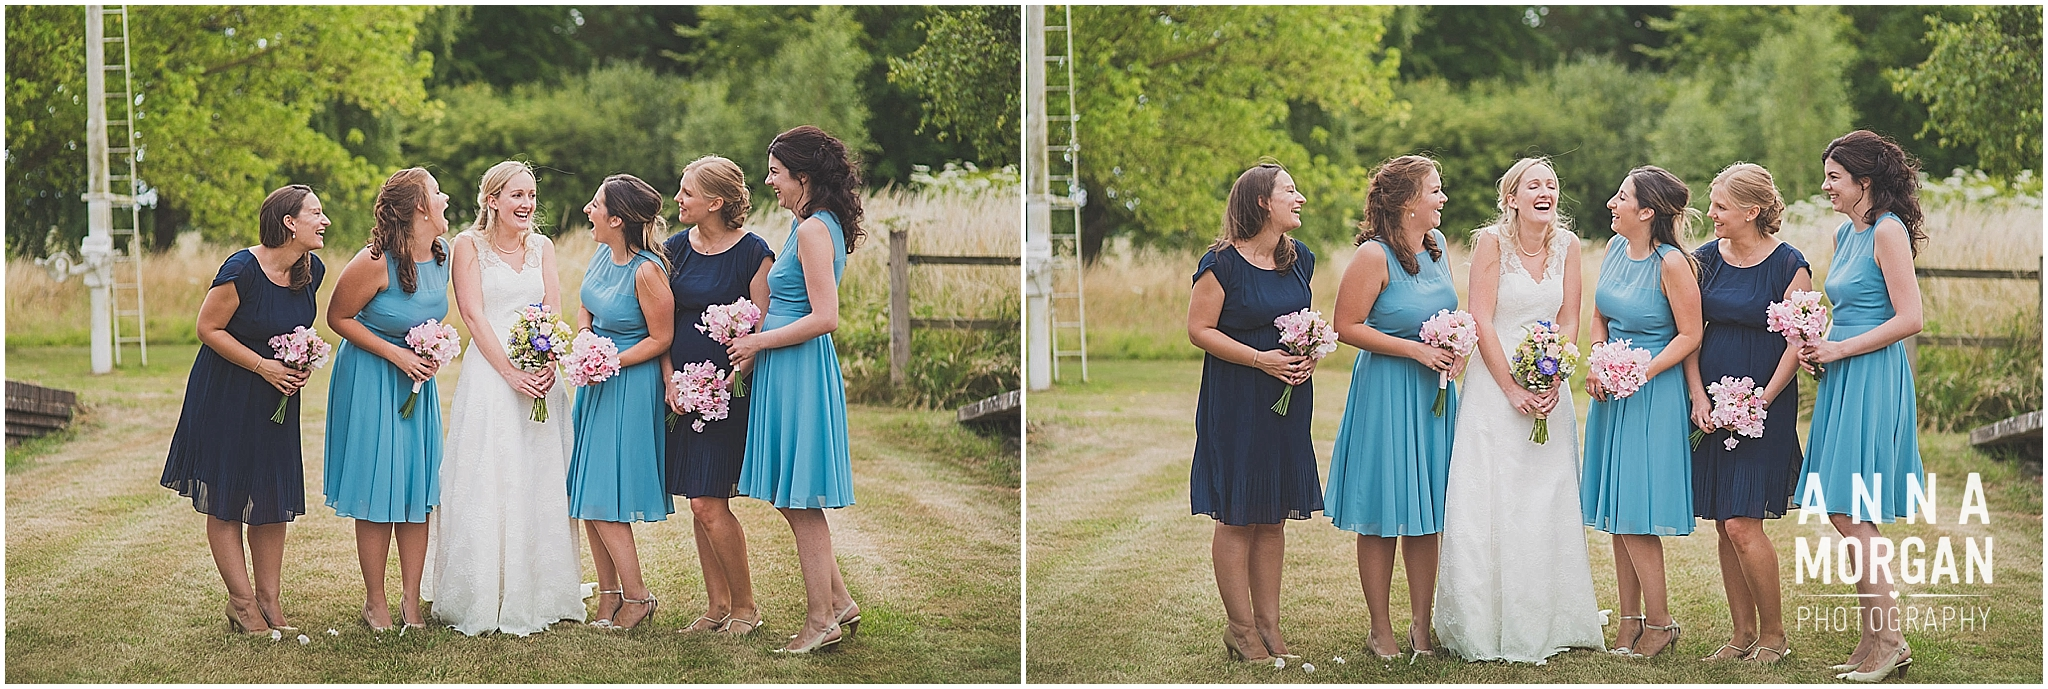 Horsebridge Station Wedding Becky & Freddie Anna Morgan Photography-24